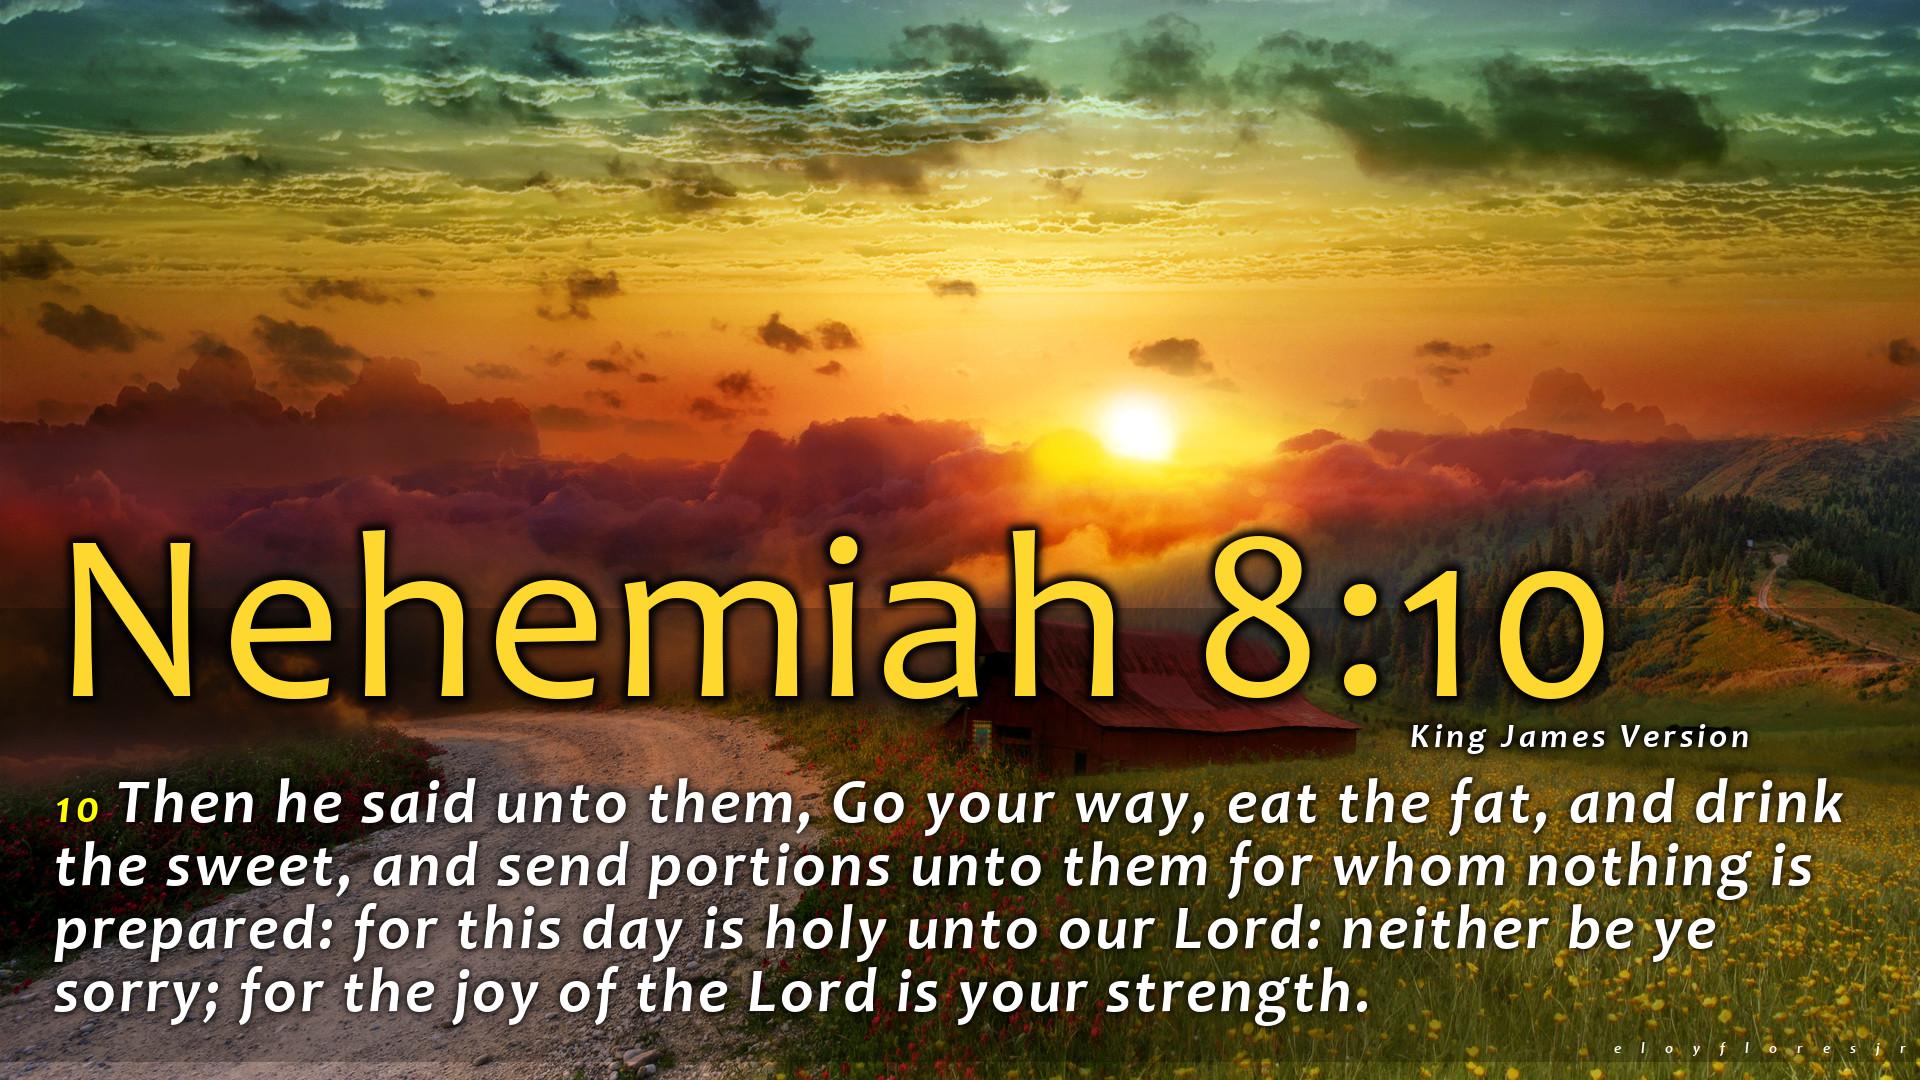 Nehemiah 8:10 wallpaper